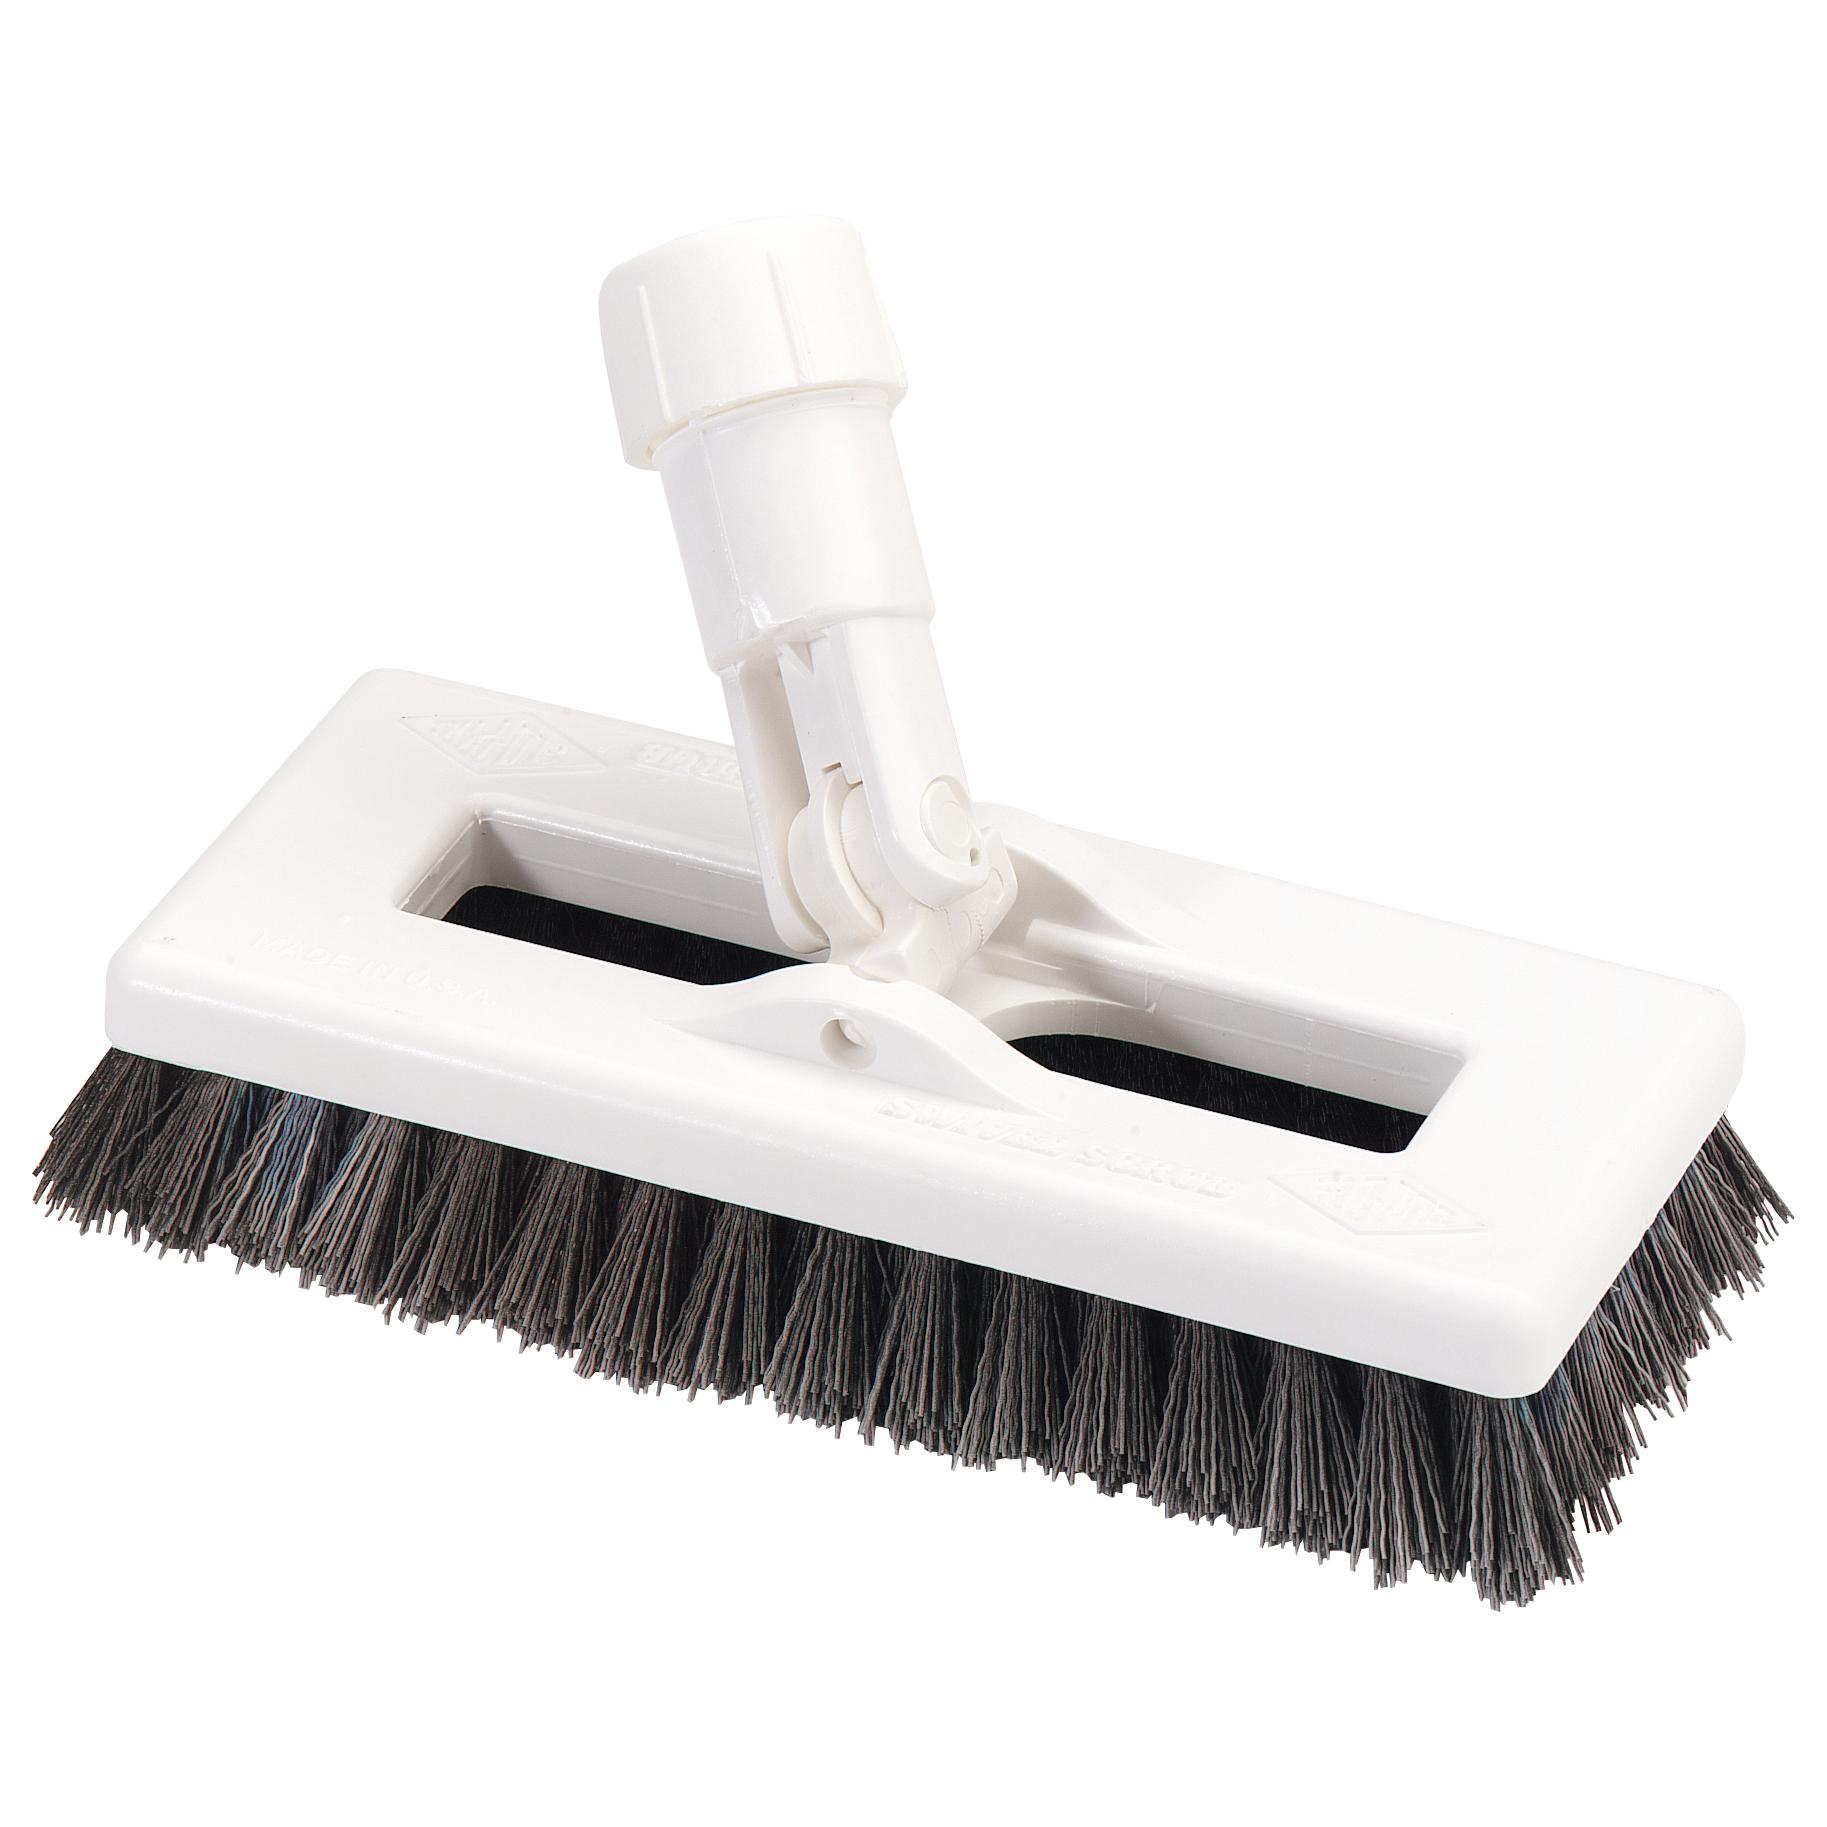 Carlisle 363883102 brush, floor